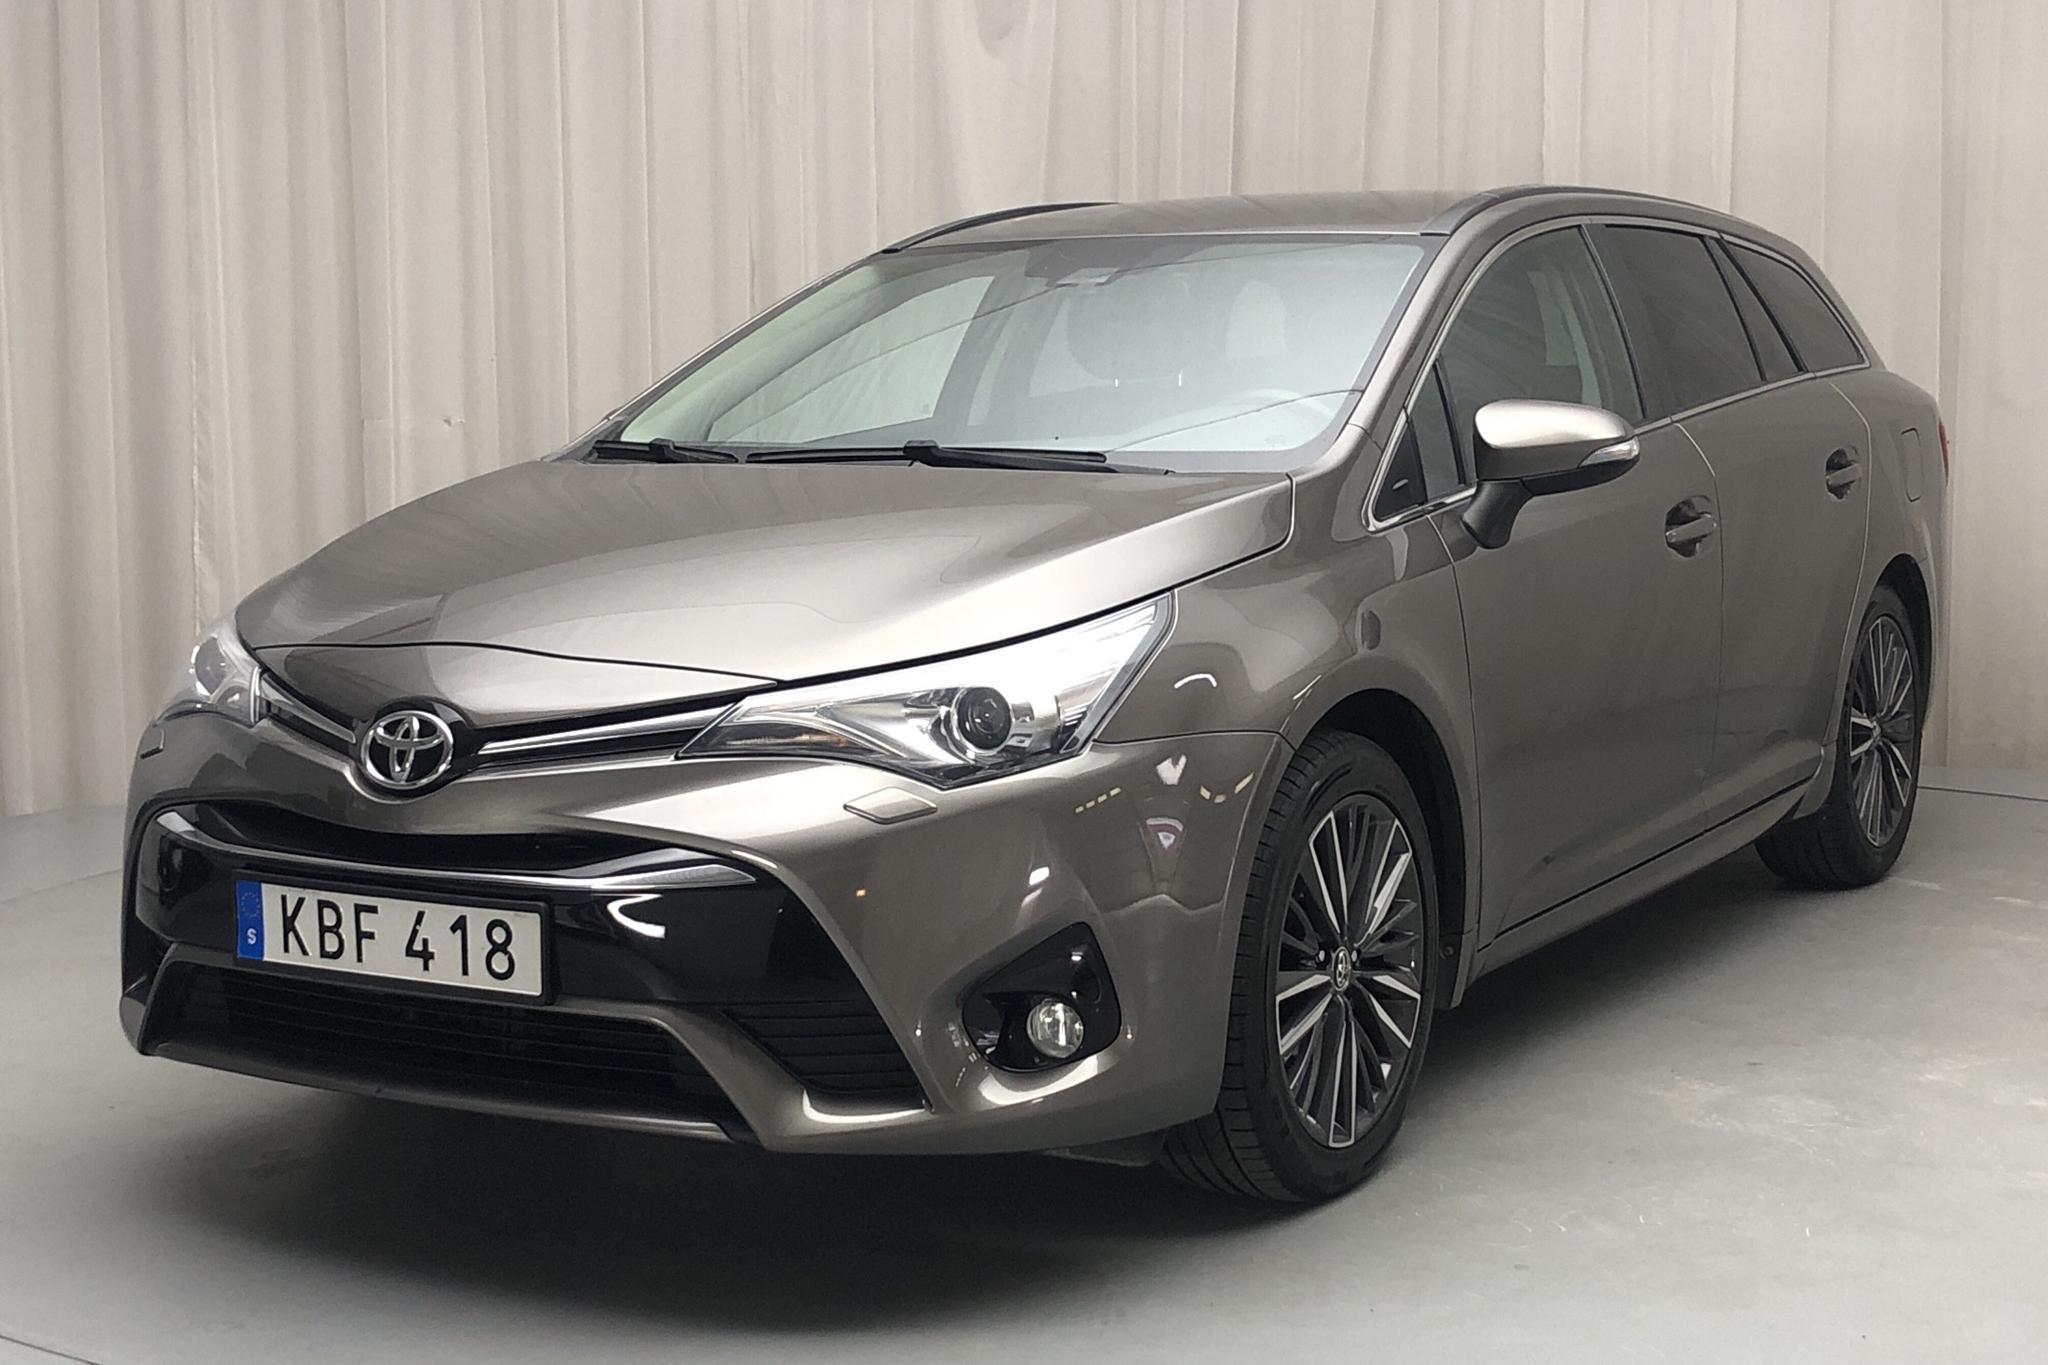 Toyota Avensis 1.8 Touring Sports (147hk) - 6 302 mil - Manuell - Dark Grey - 2018